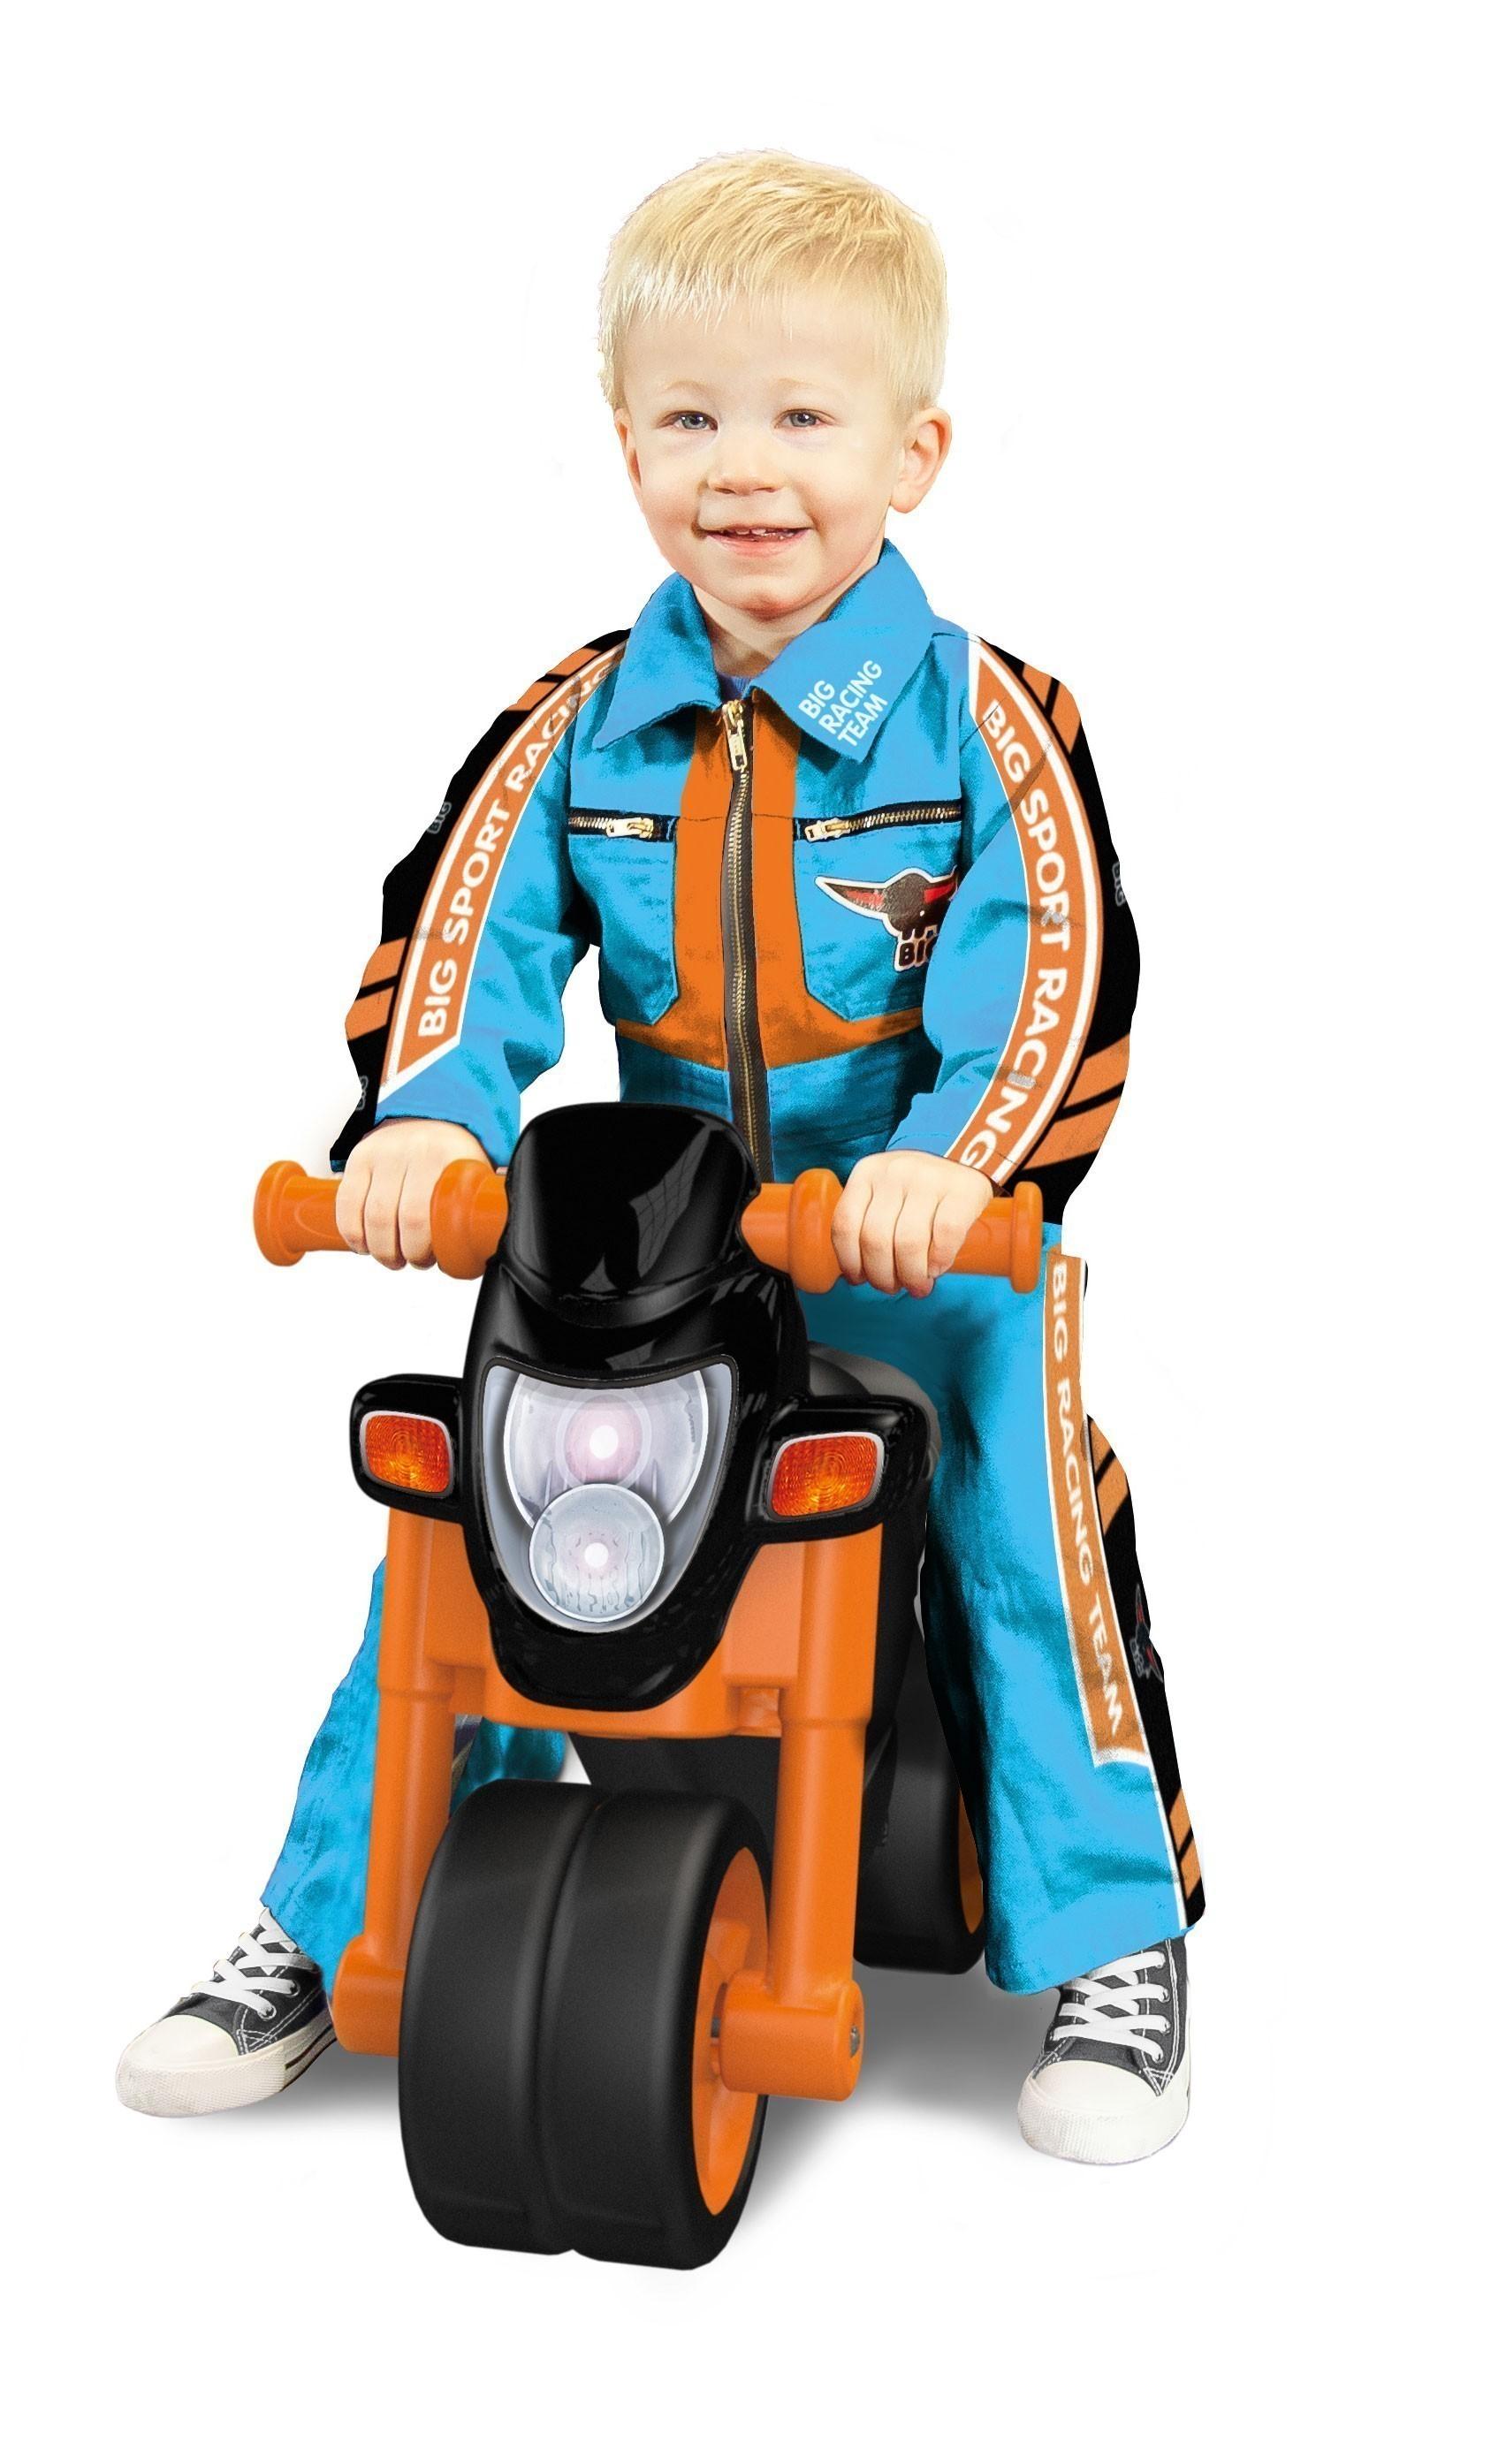 BIG Laufrad Sport Bike schwarz-orange Bild 1